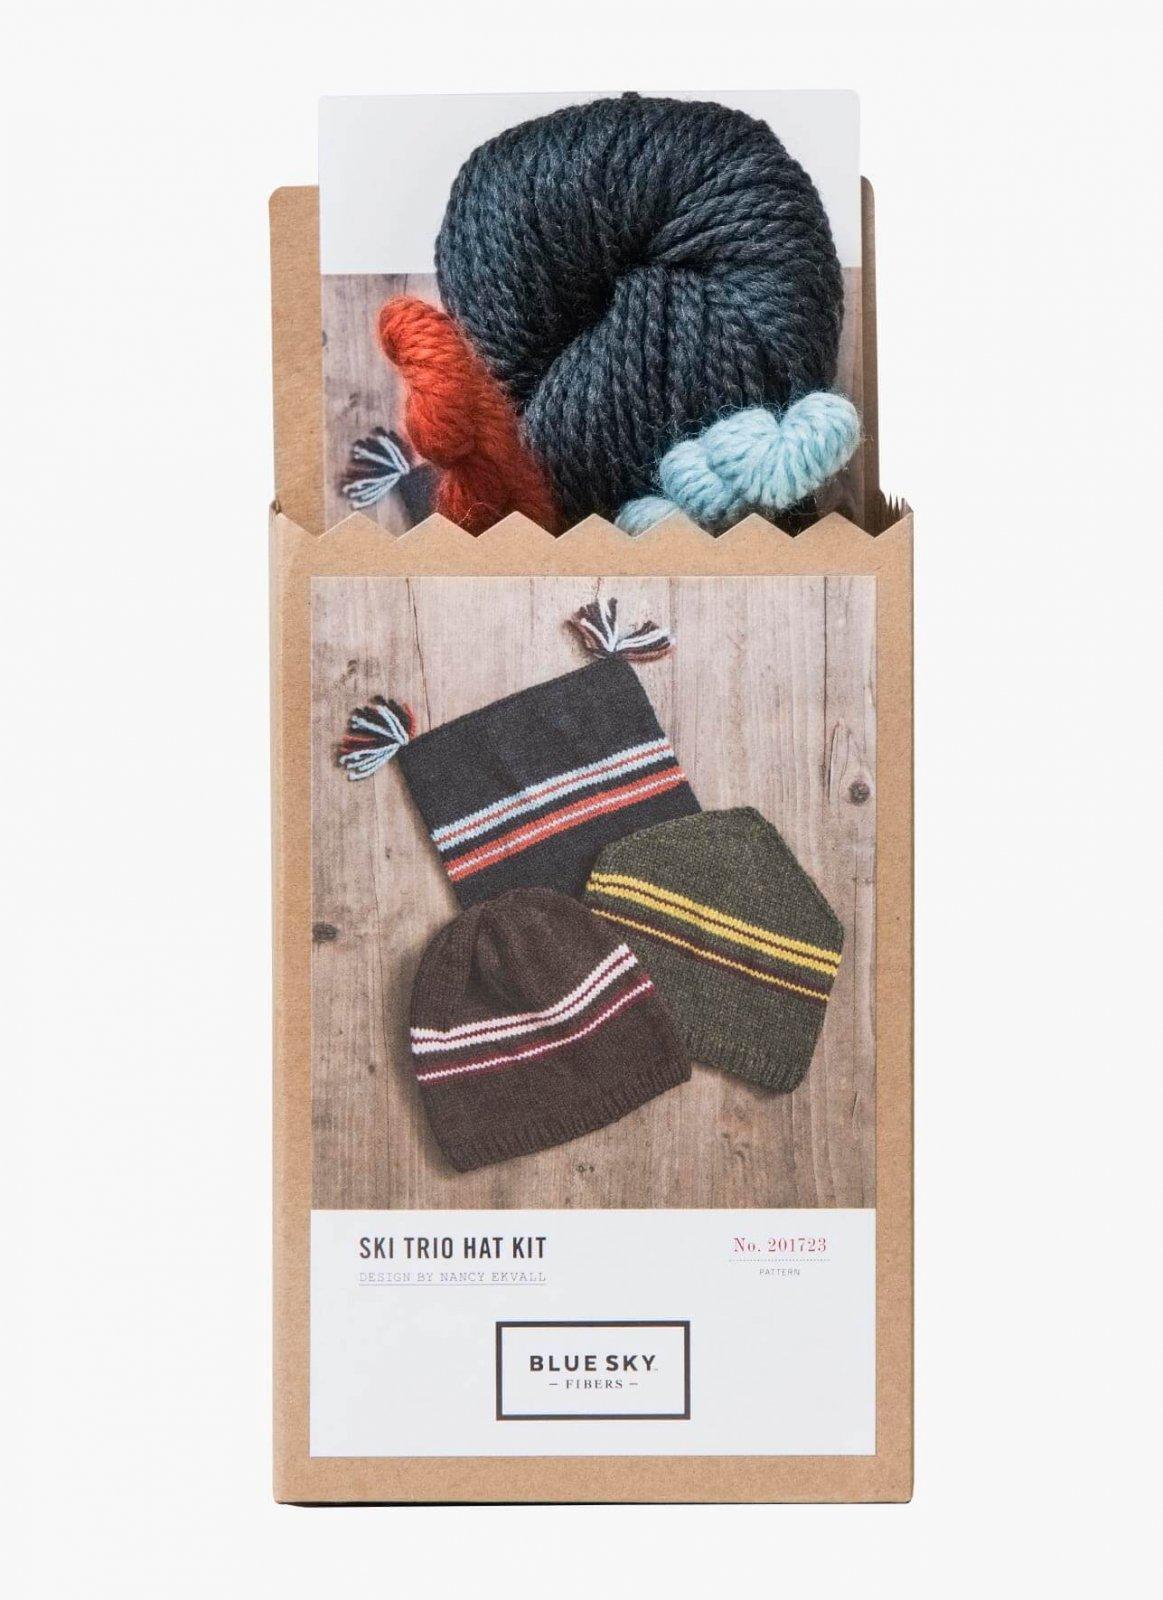 Blue Sky Fibers Ski Trio Hat Kit